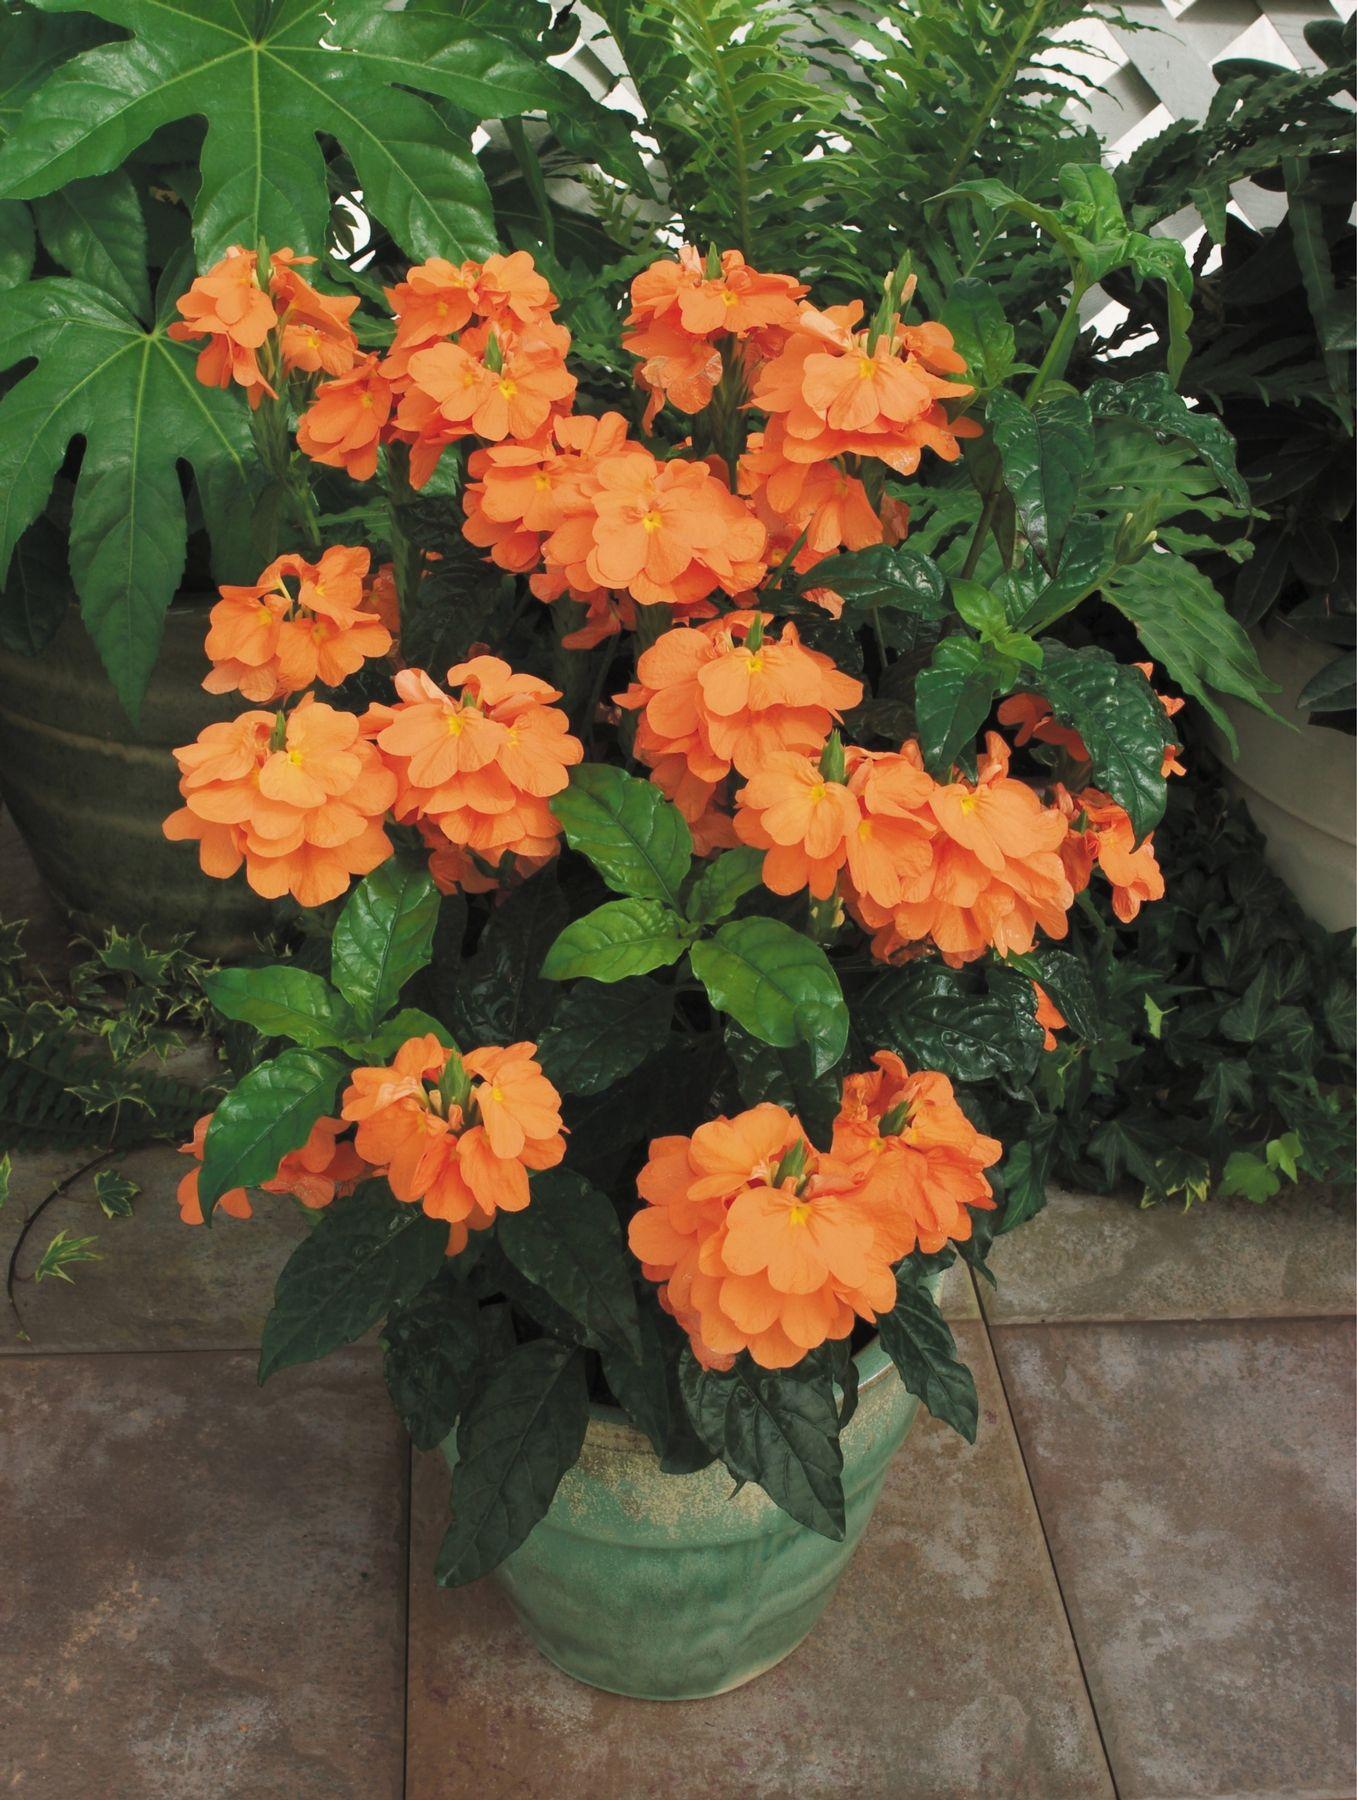 Orange Marmalade Firecracker Flower Care My Garden Pinterest